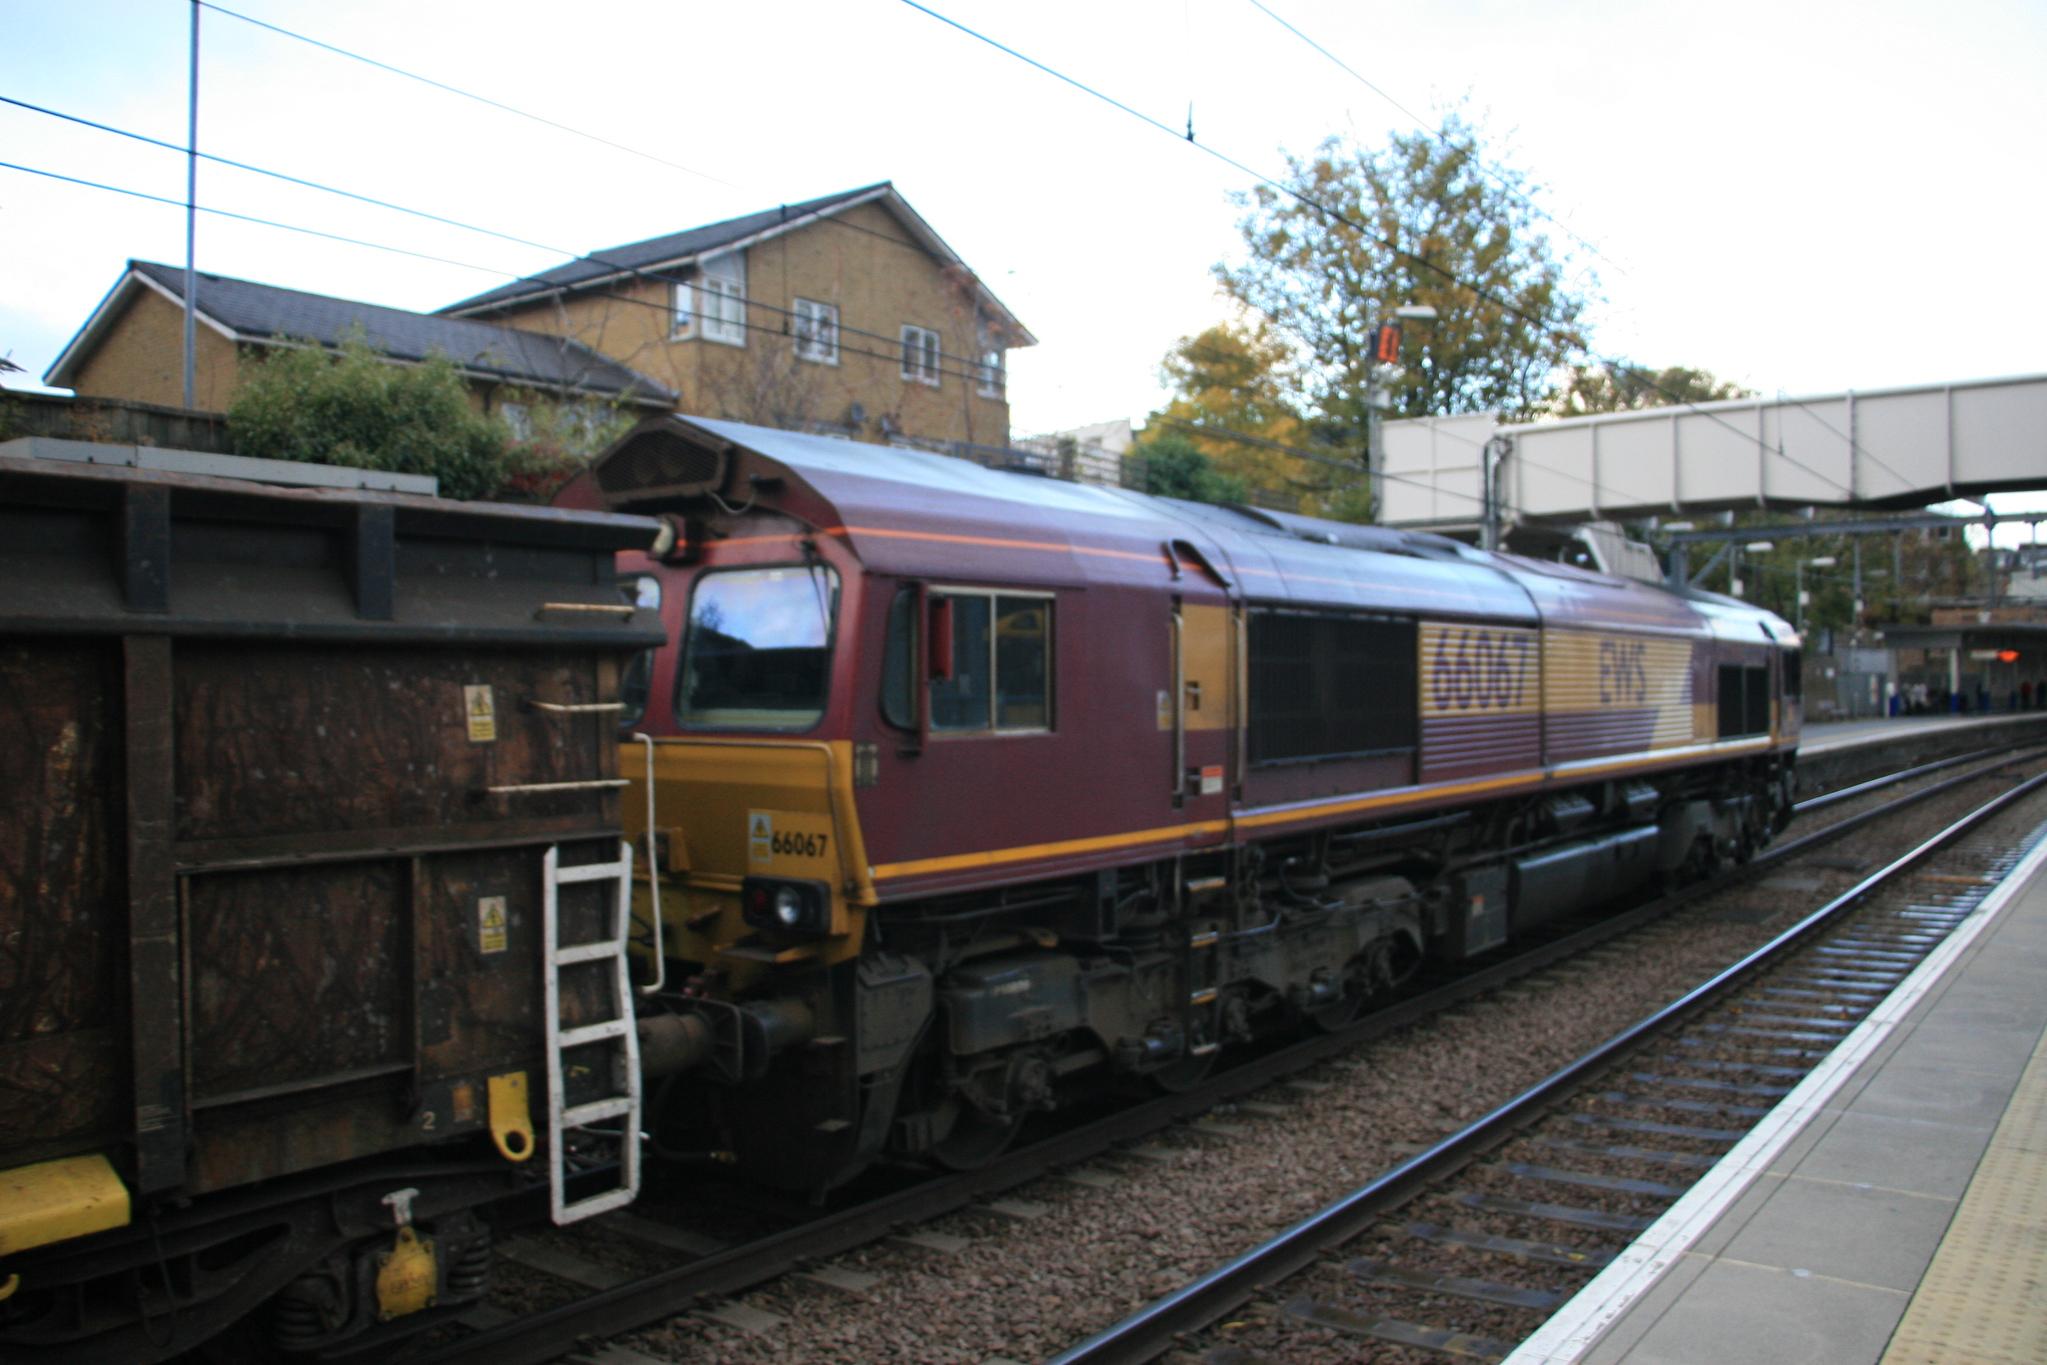 66067_DBS_HighburyAndIslington_07112016 (16)